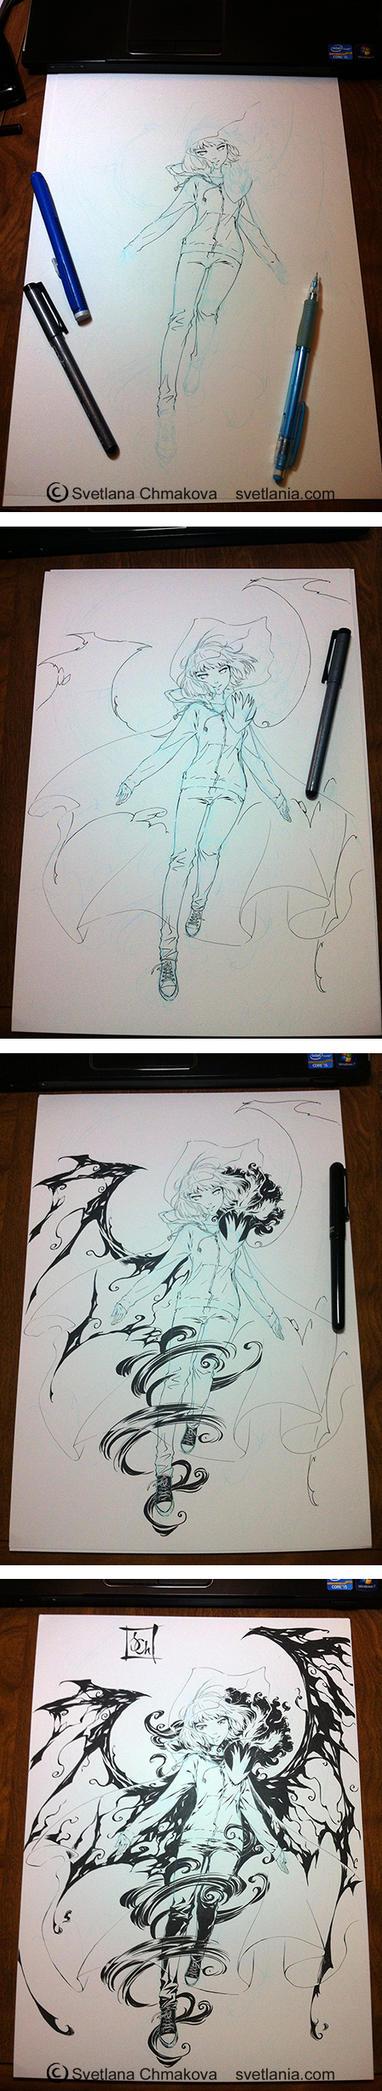 Inking Process for Nightschool print by svetlania